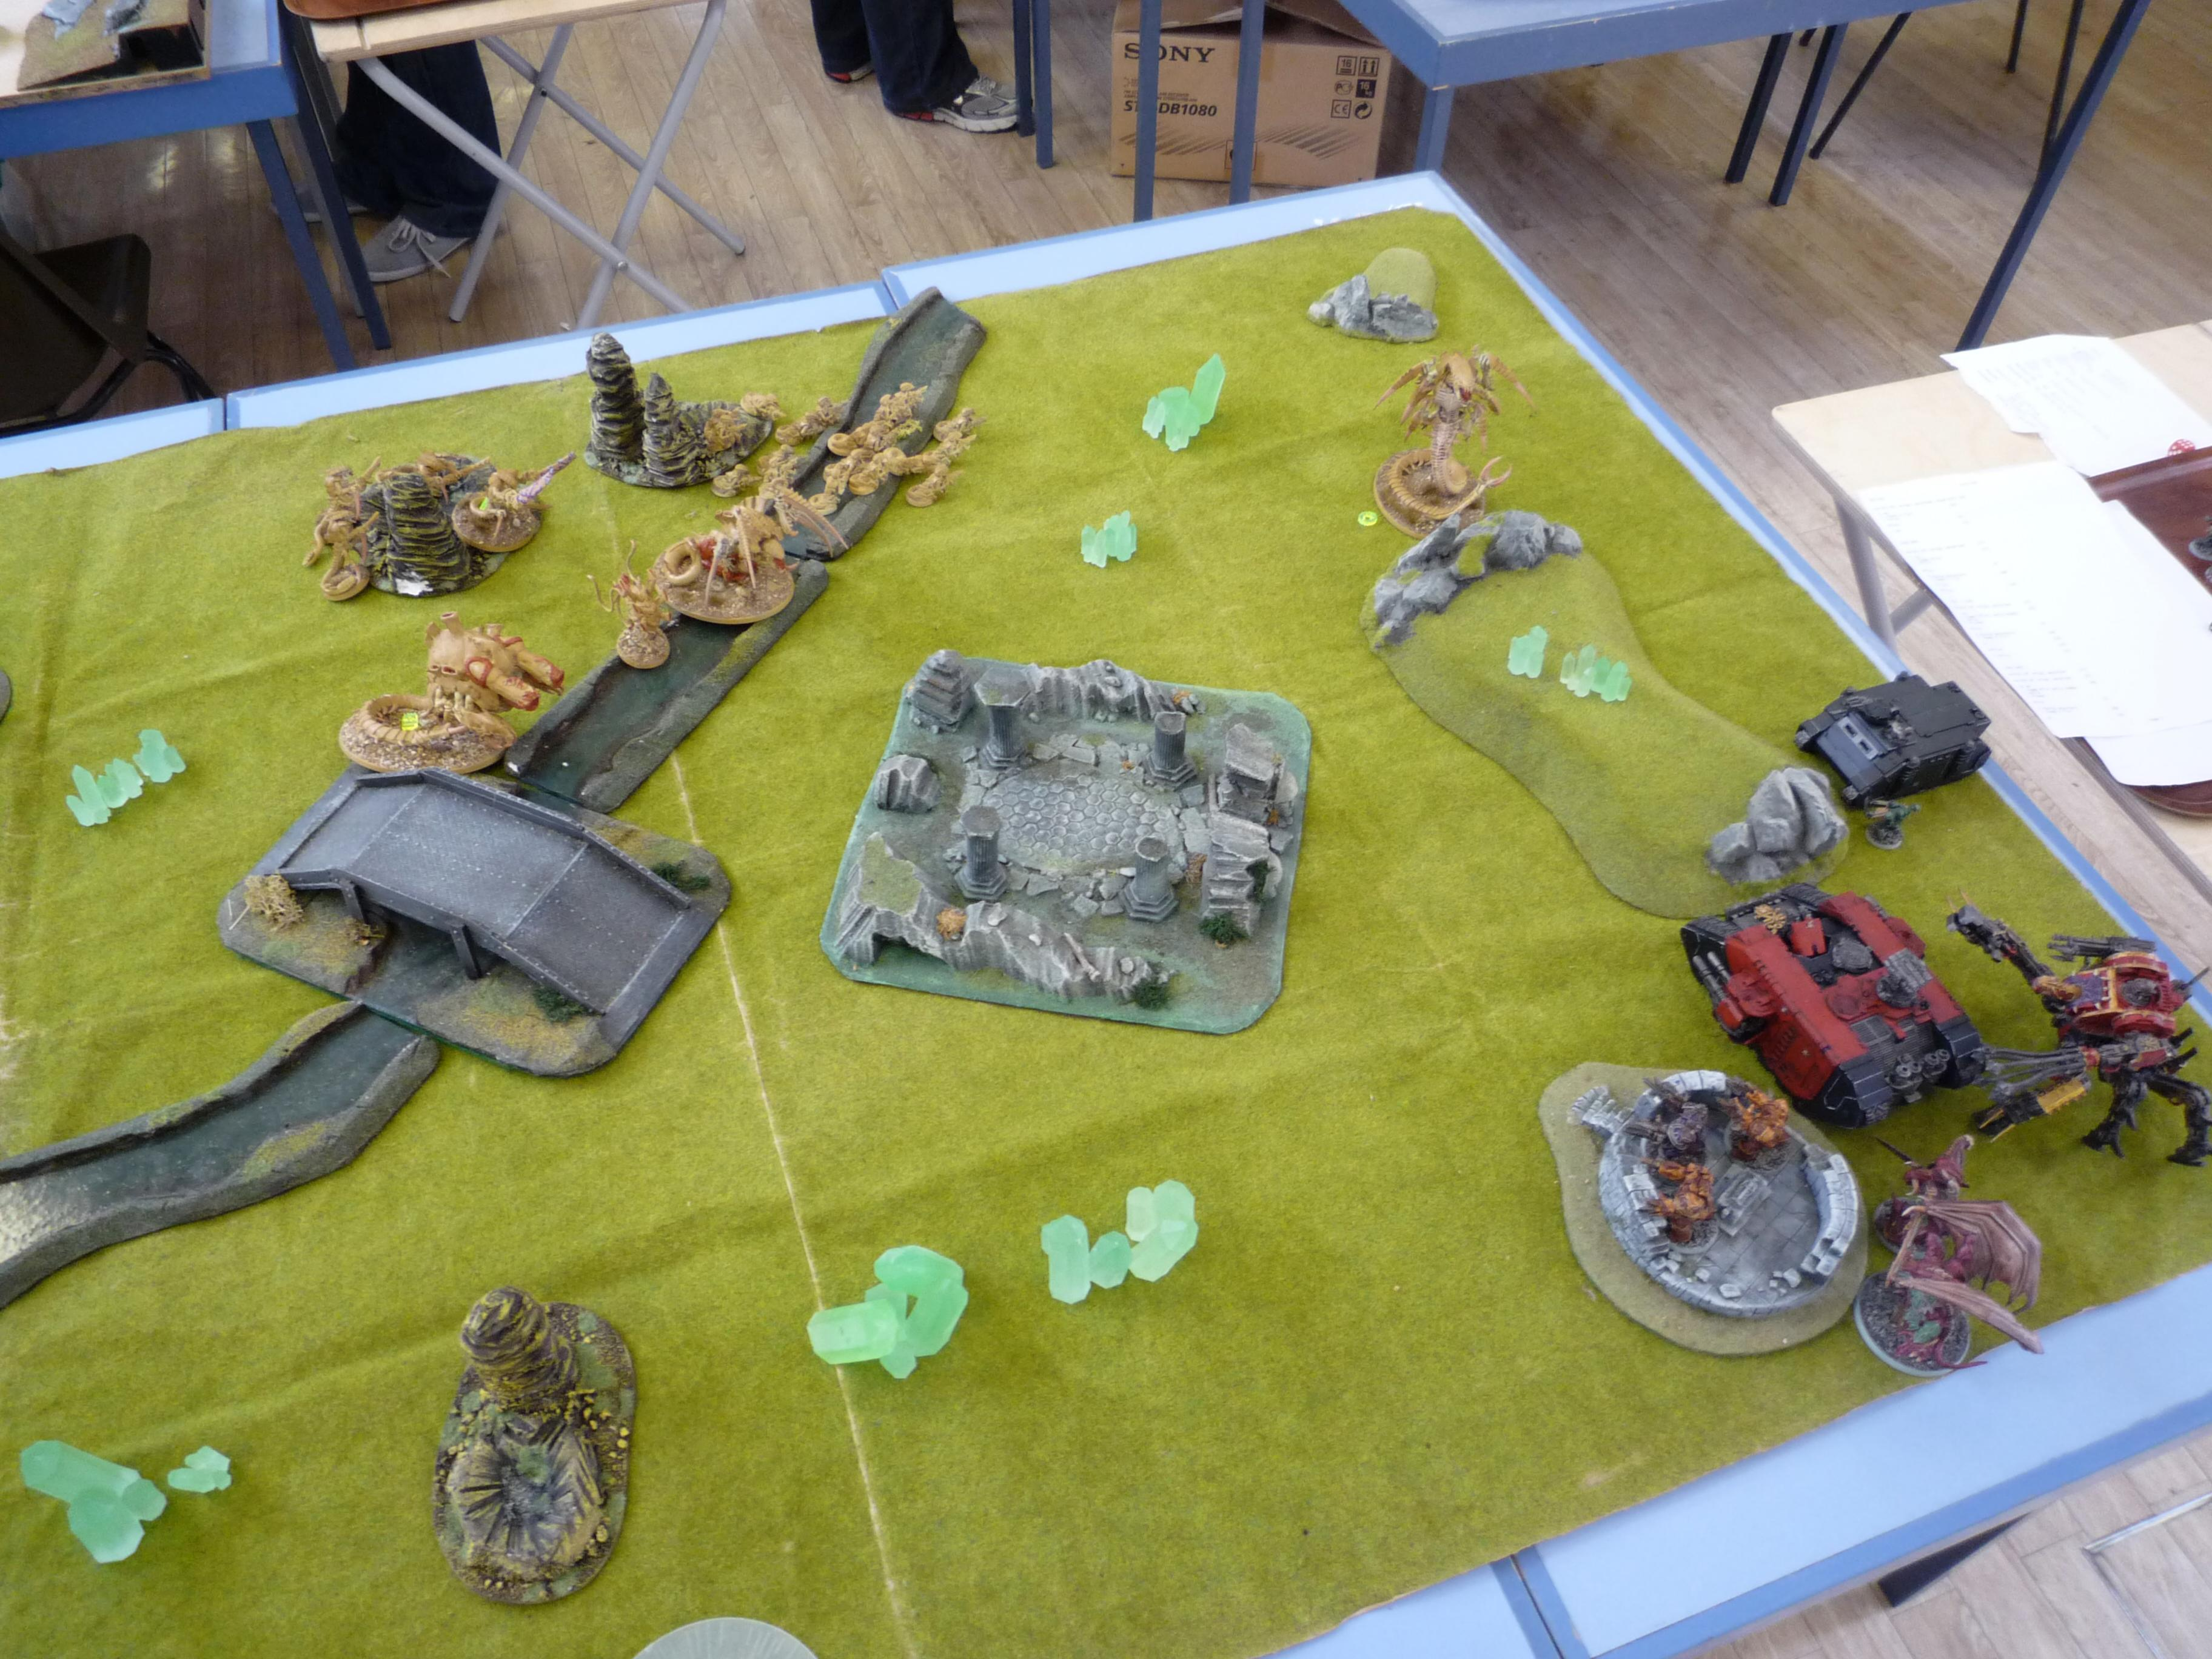 Hive Fleet Kielbasa, Tyranids, Warhammer 40,000